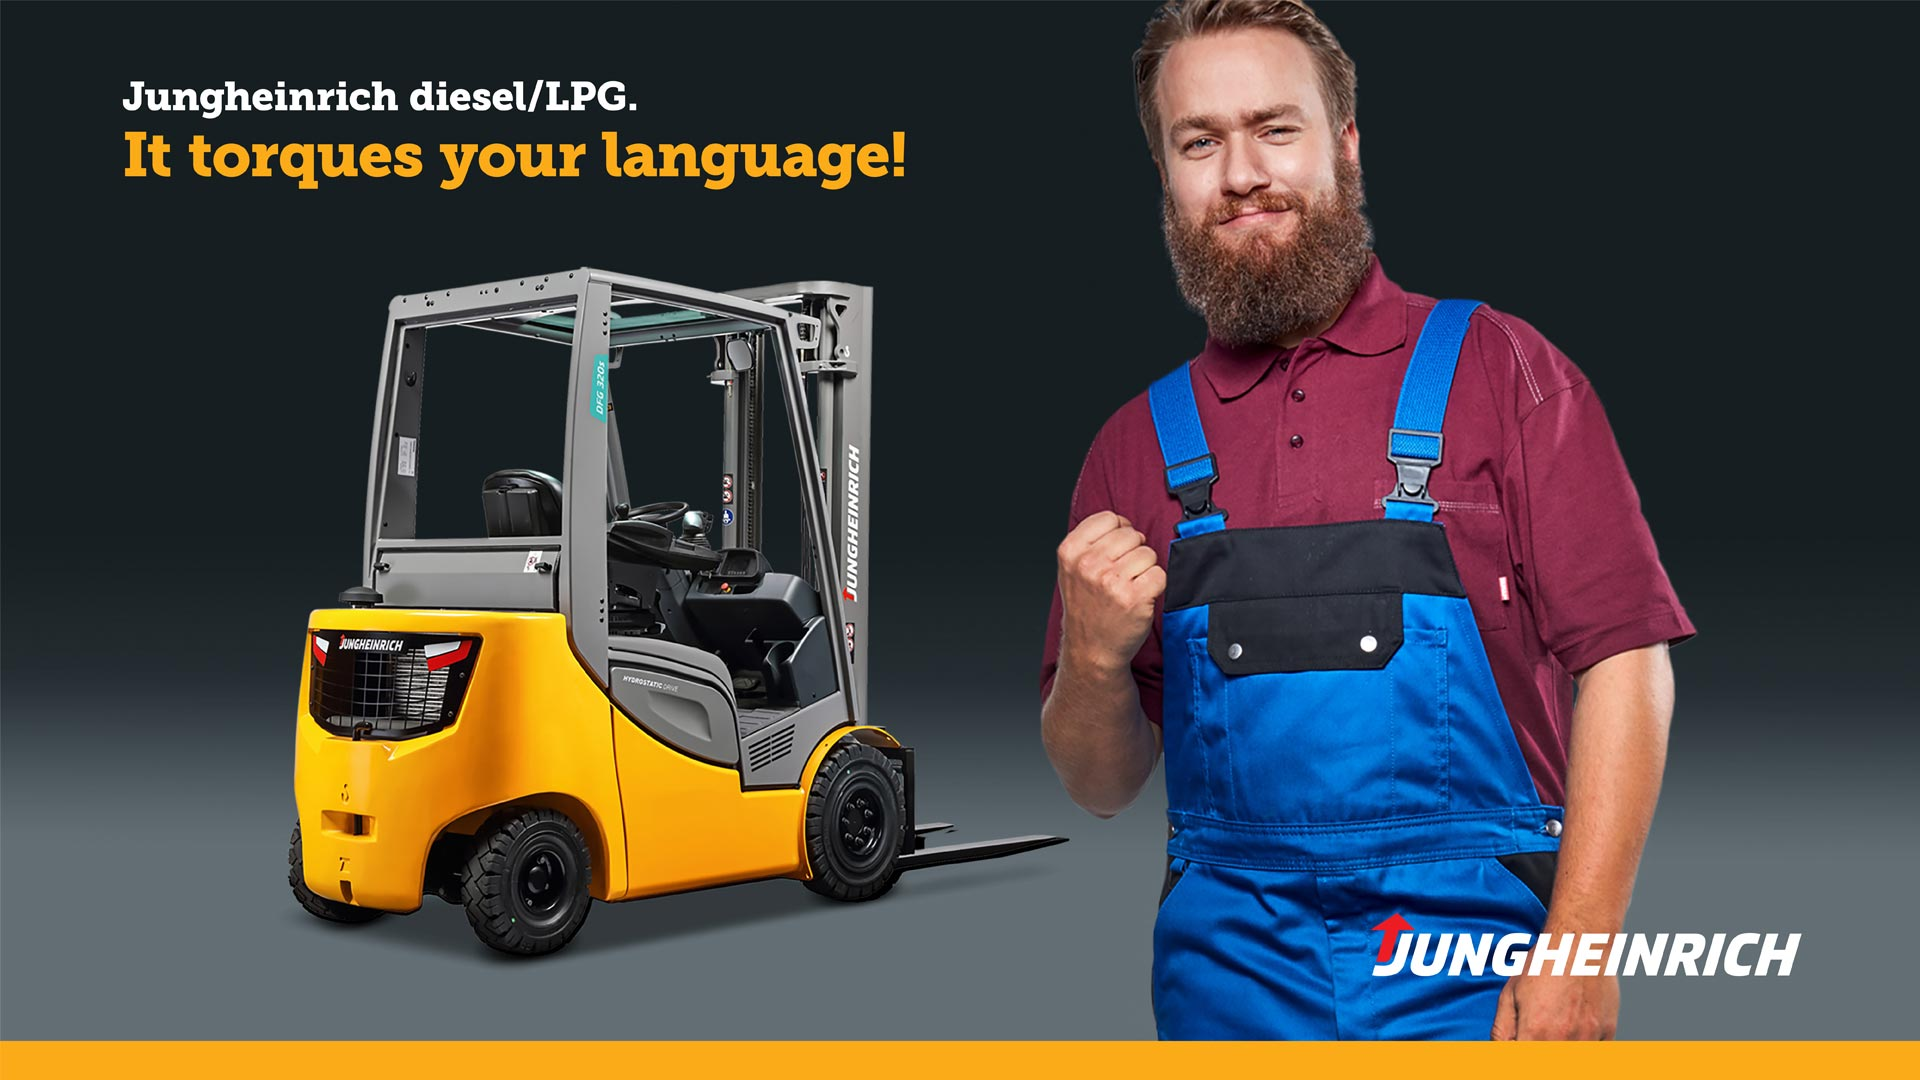 Jungheinrich campaign - torques your language